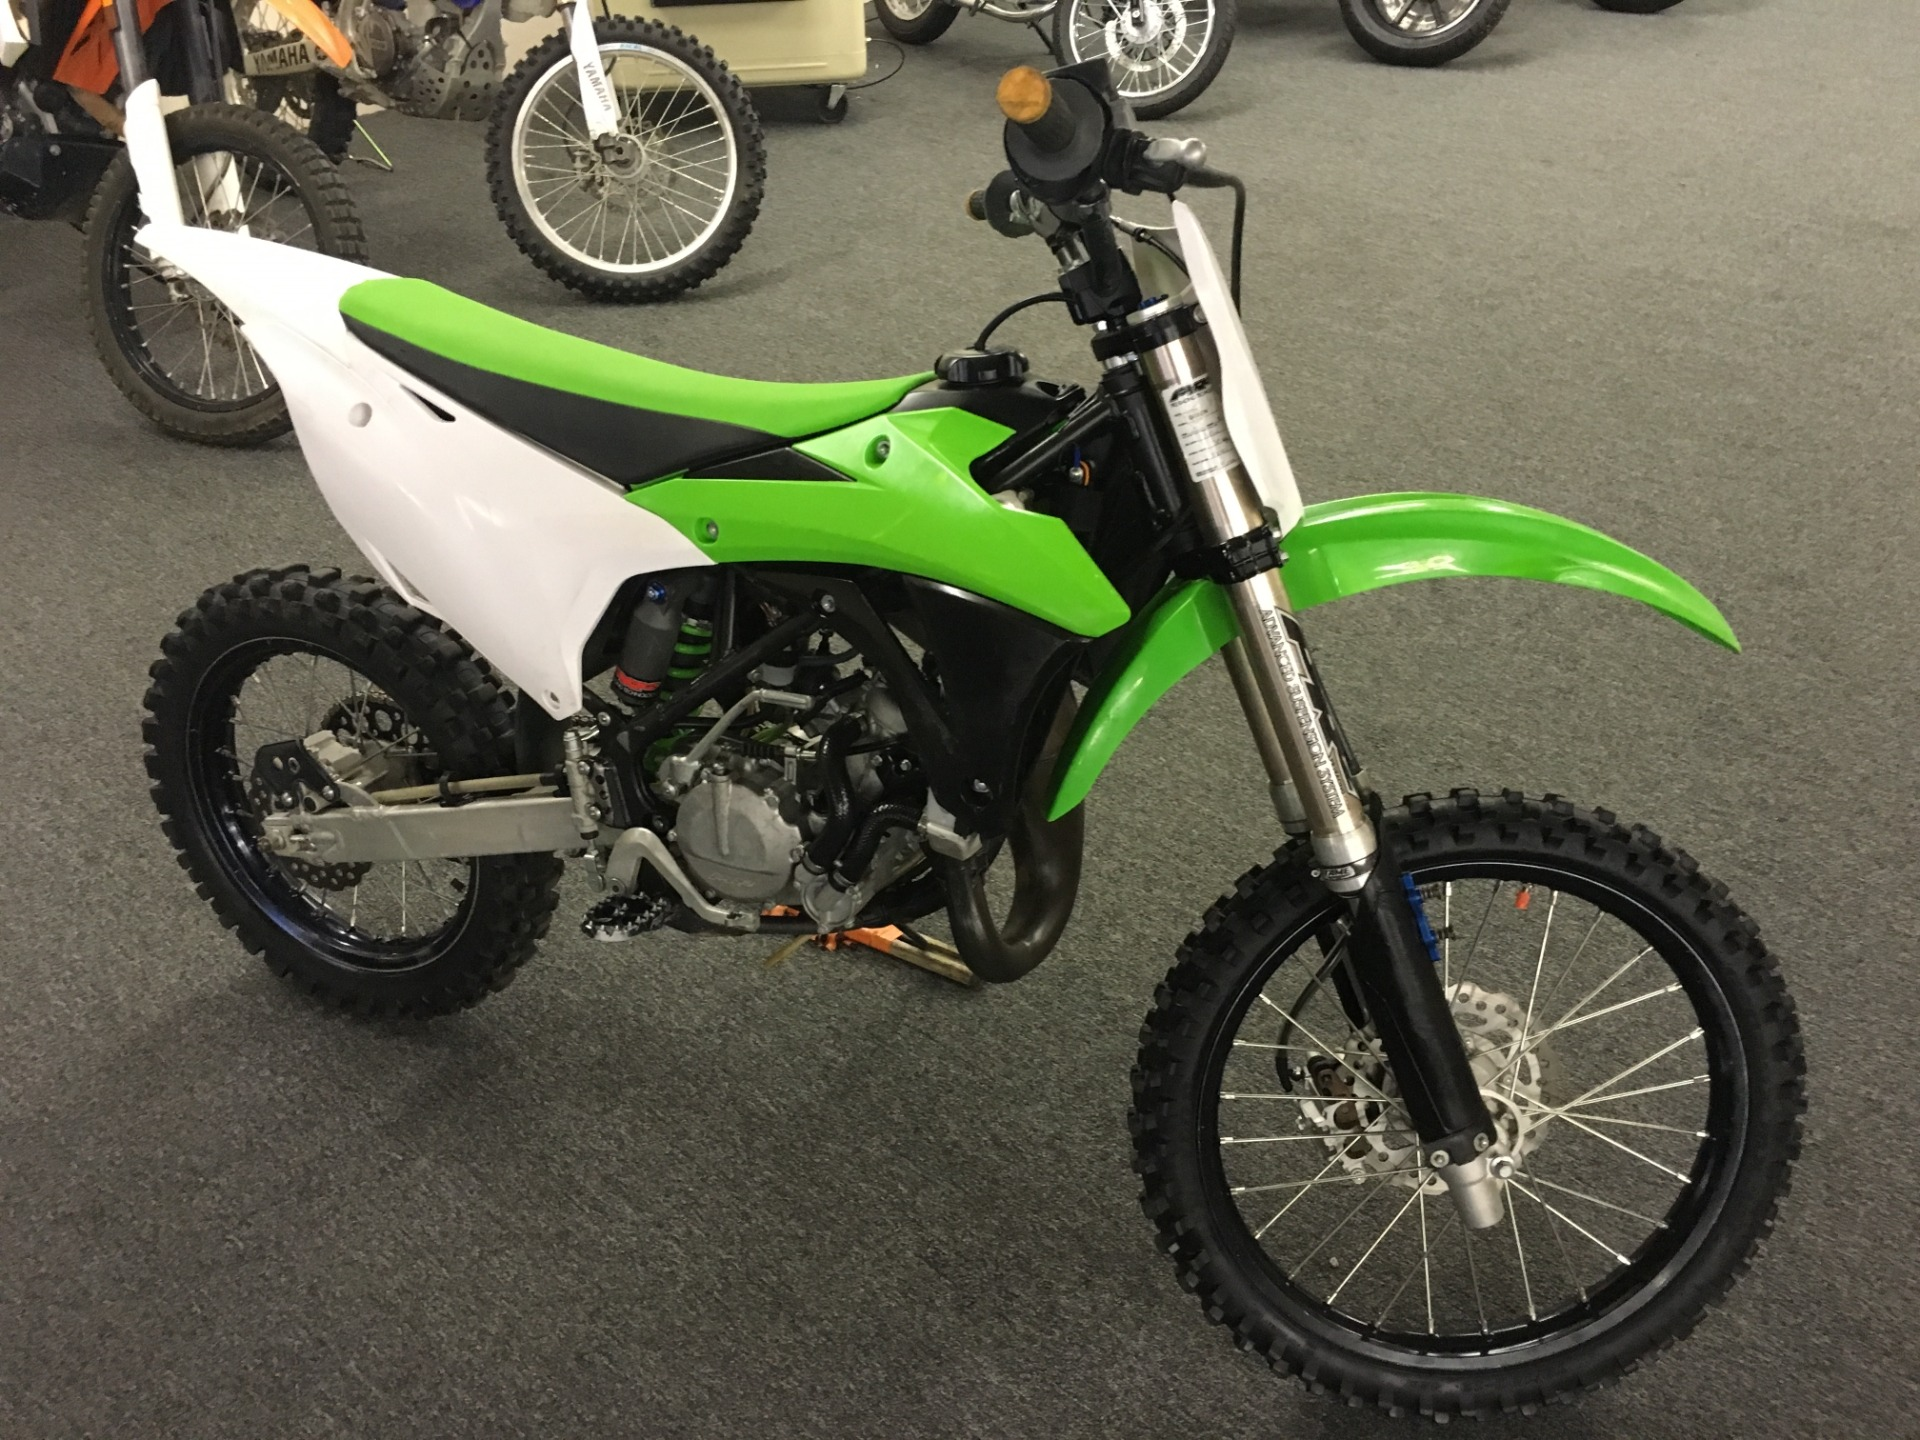 2014 Kawasaki KX™100 in Draper, Utah